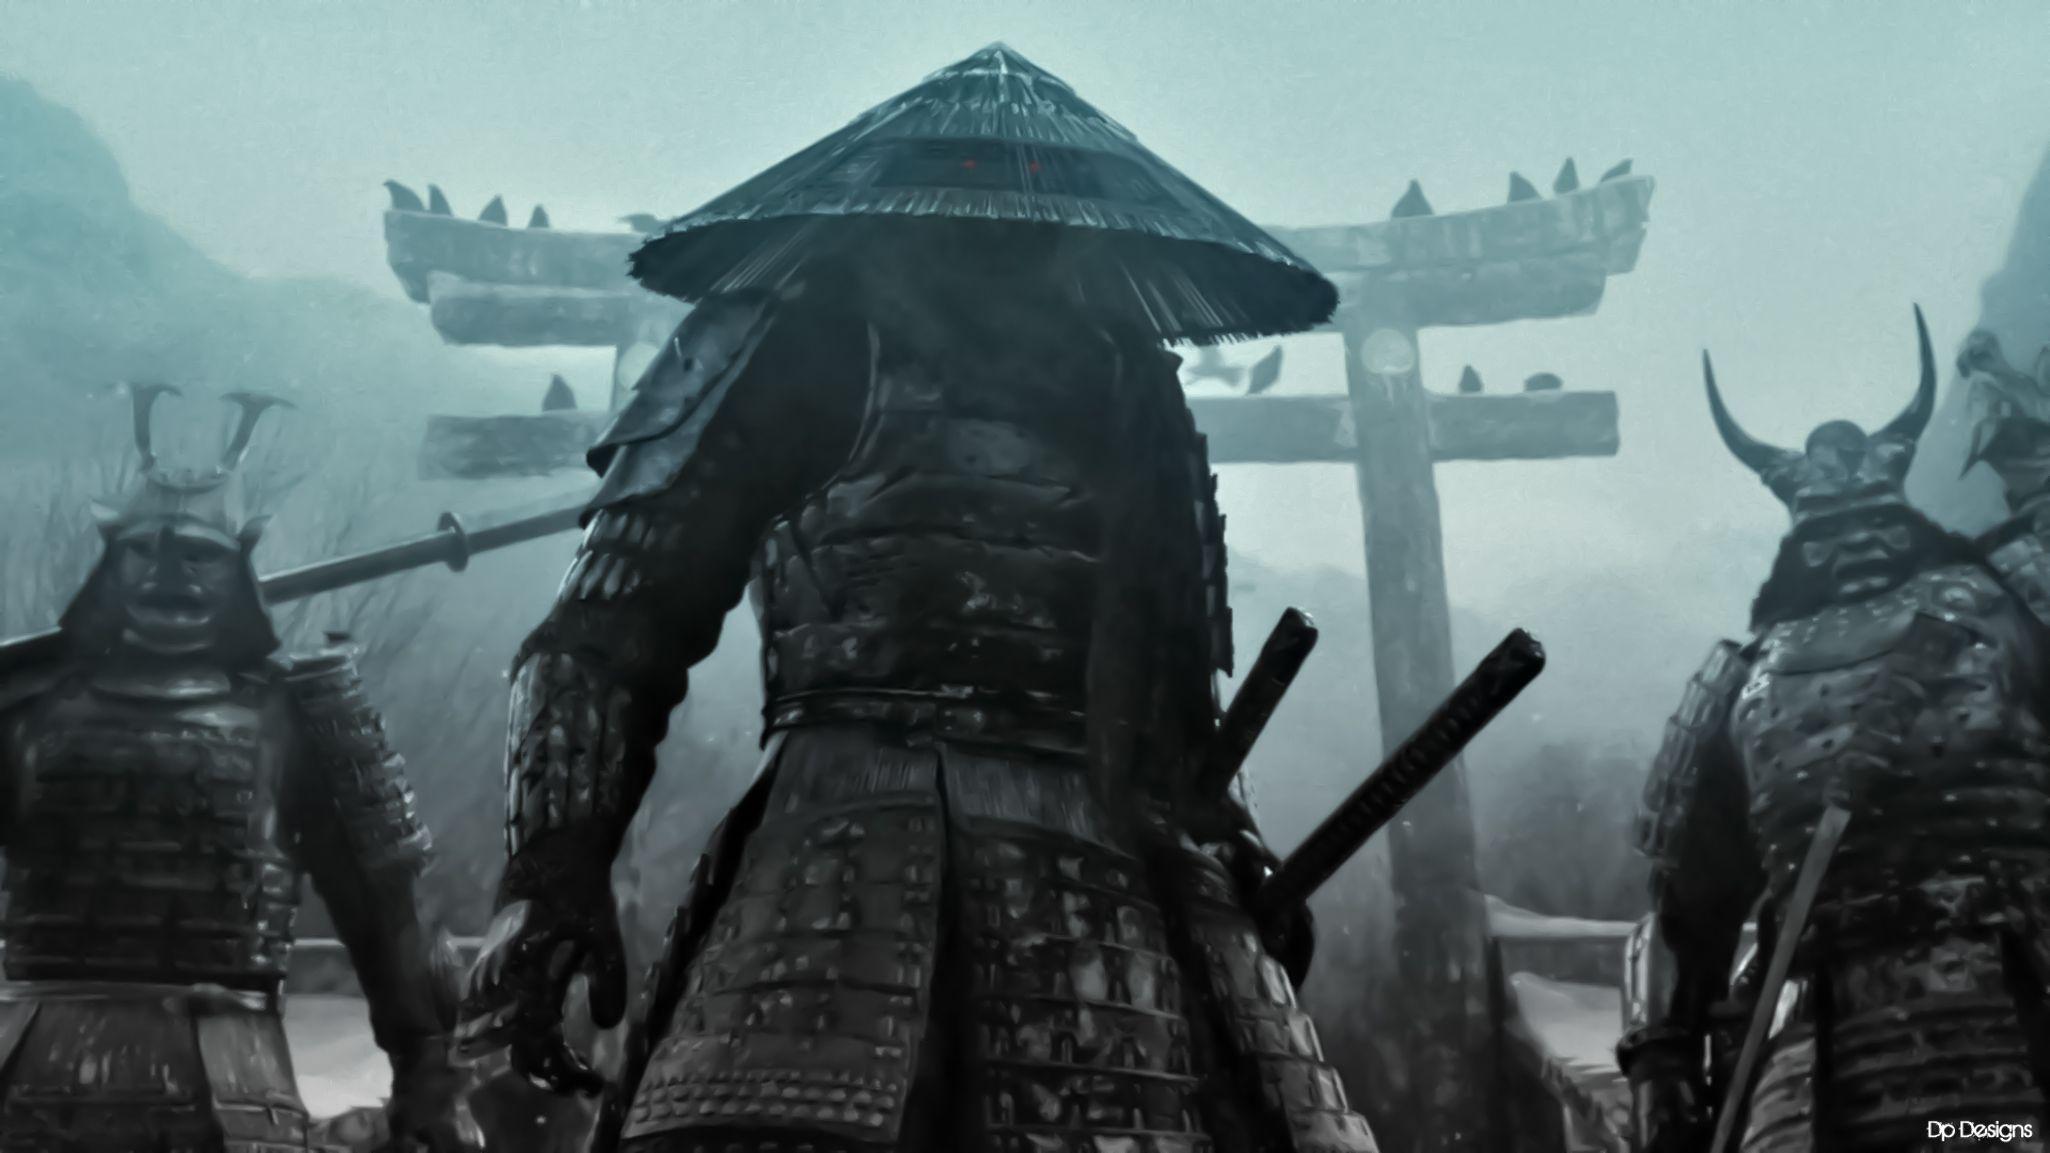 Dark Samurai Wallpapers Top Free Dark Samurai Backgrounds Wallpaperaccess